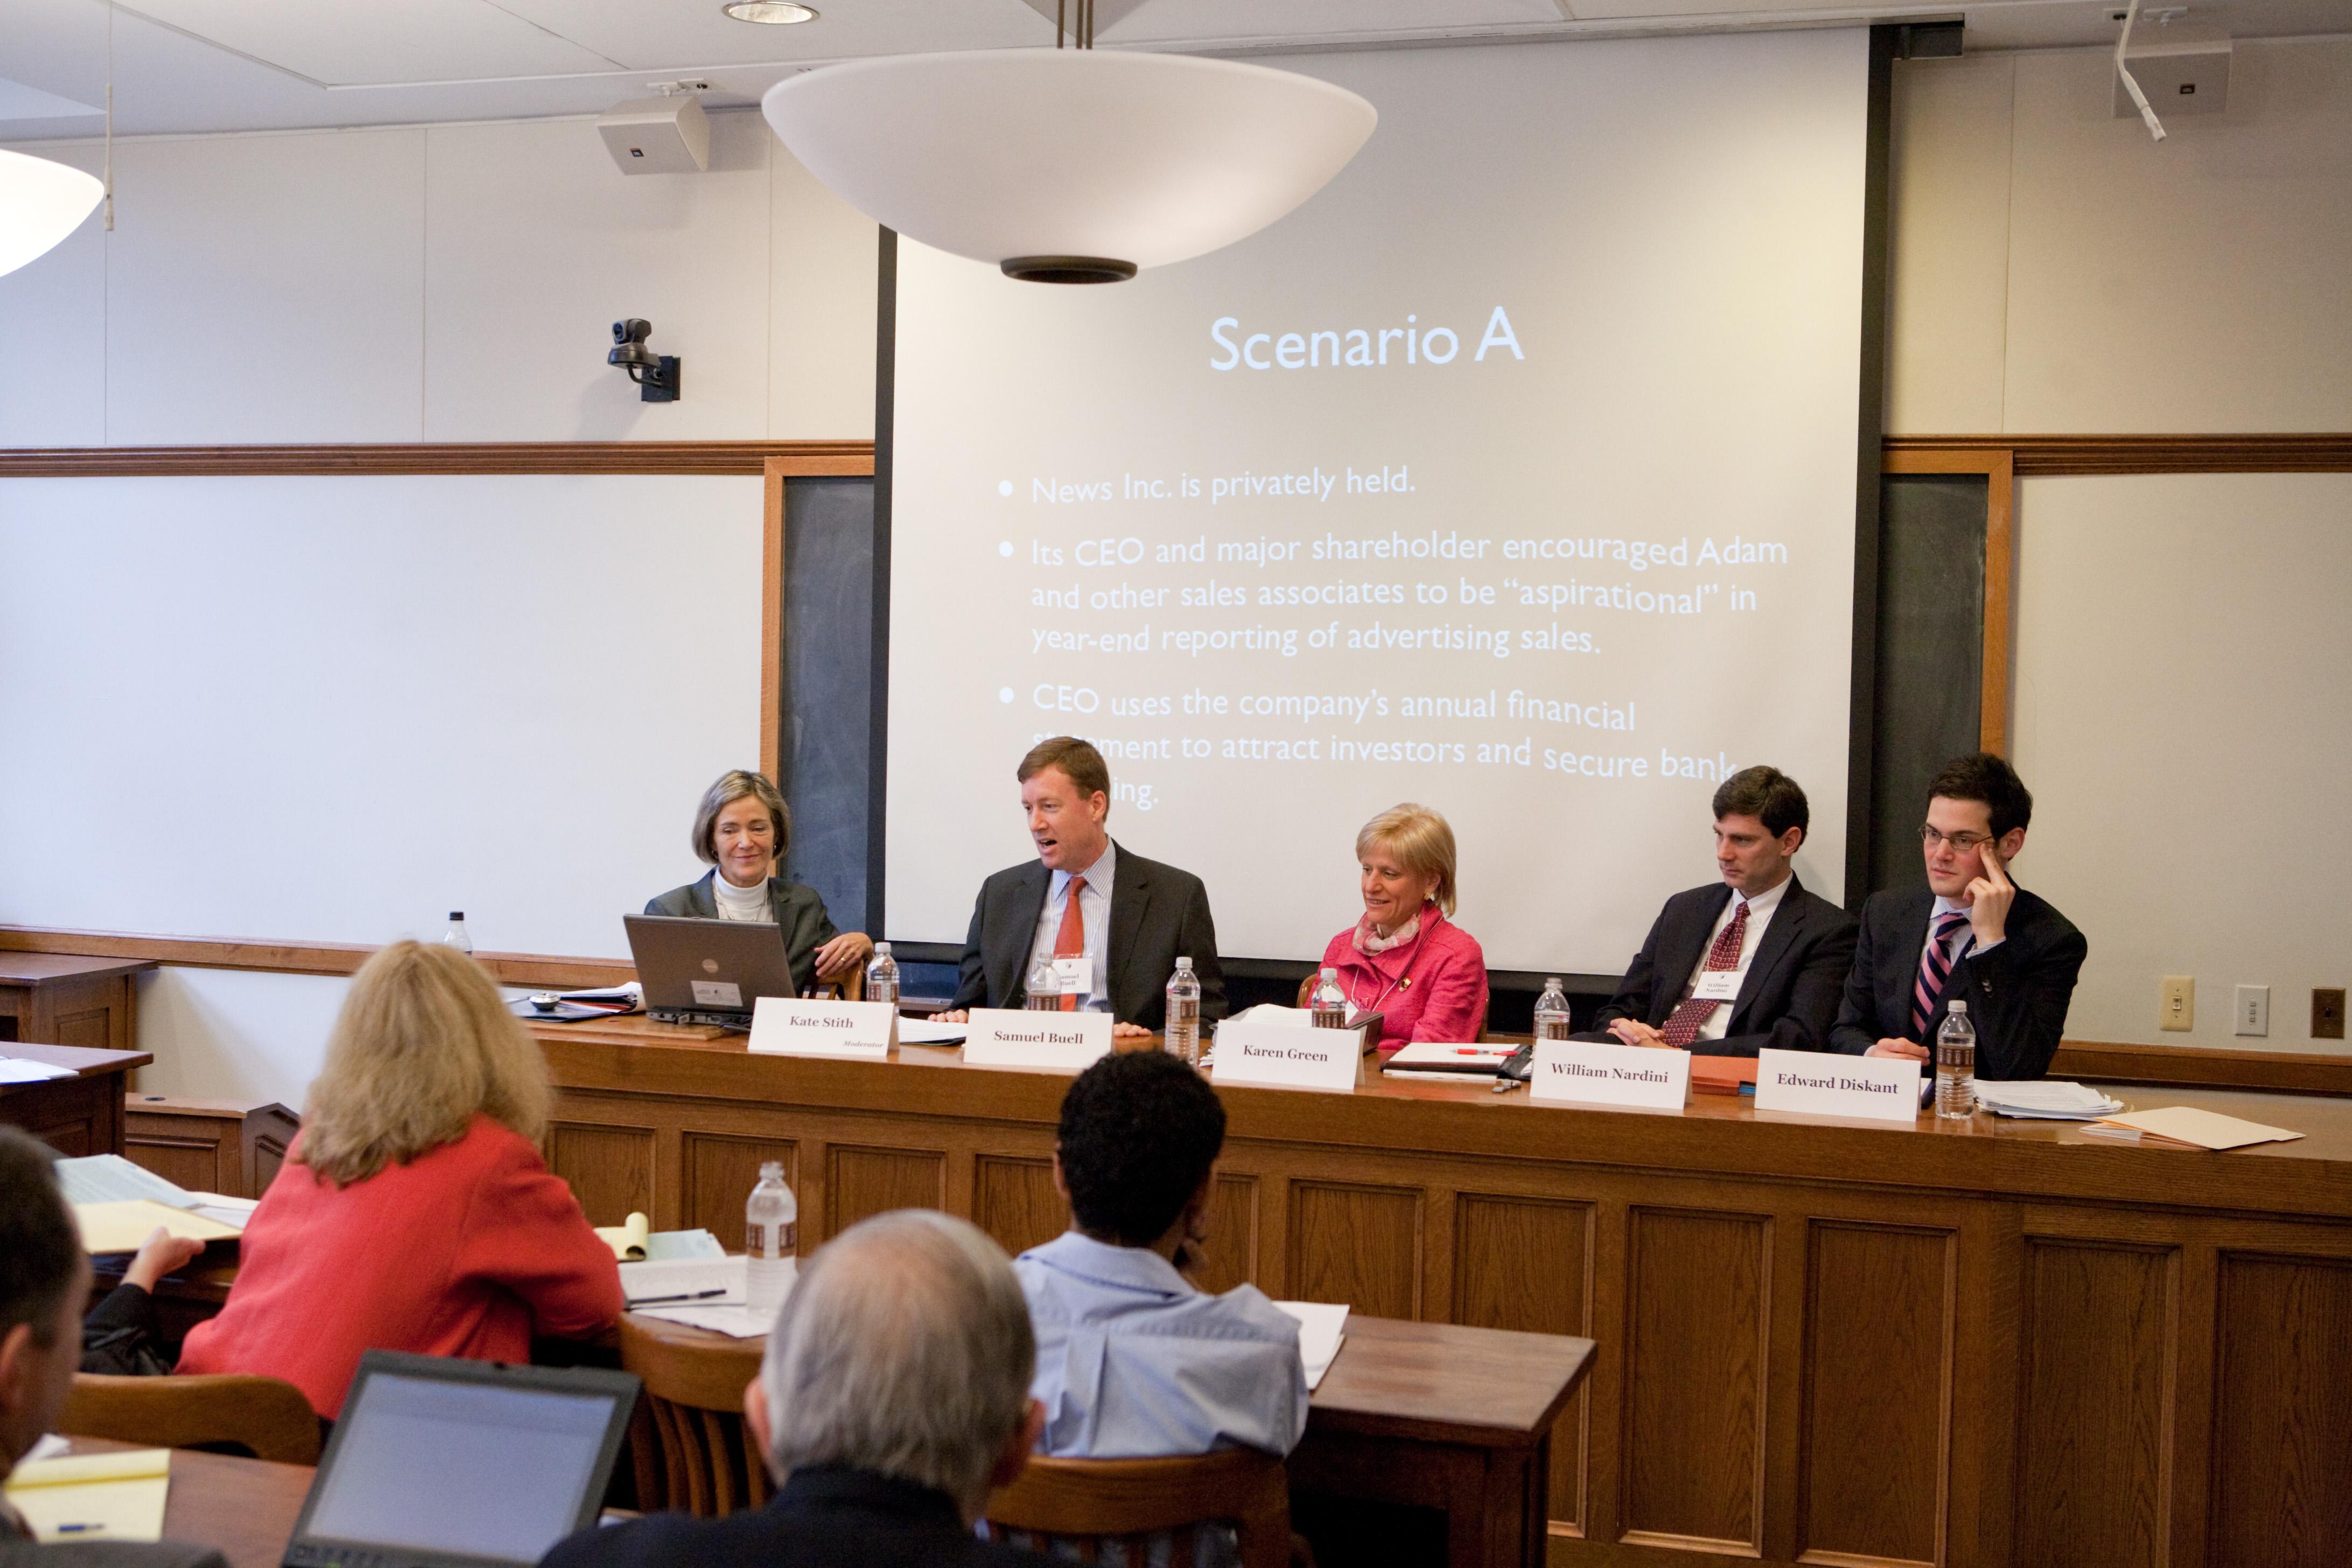 YLS Prof. Kate Stith, Washington U. Law Prof. Samuel Buell, Karen Green, William Nardini '94, and Edward Diskant '08